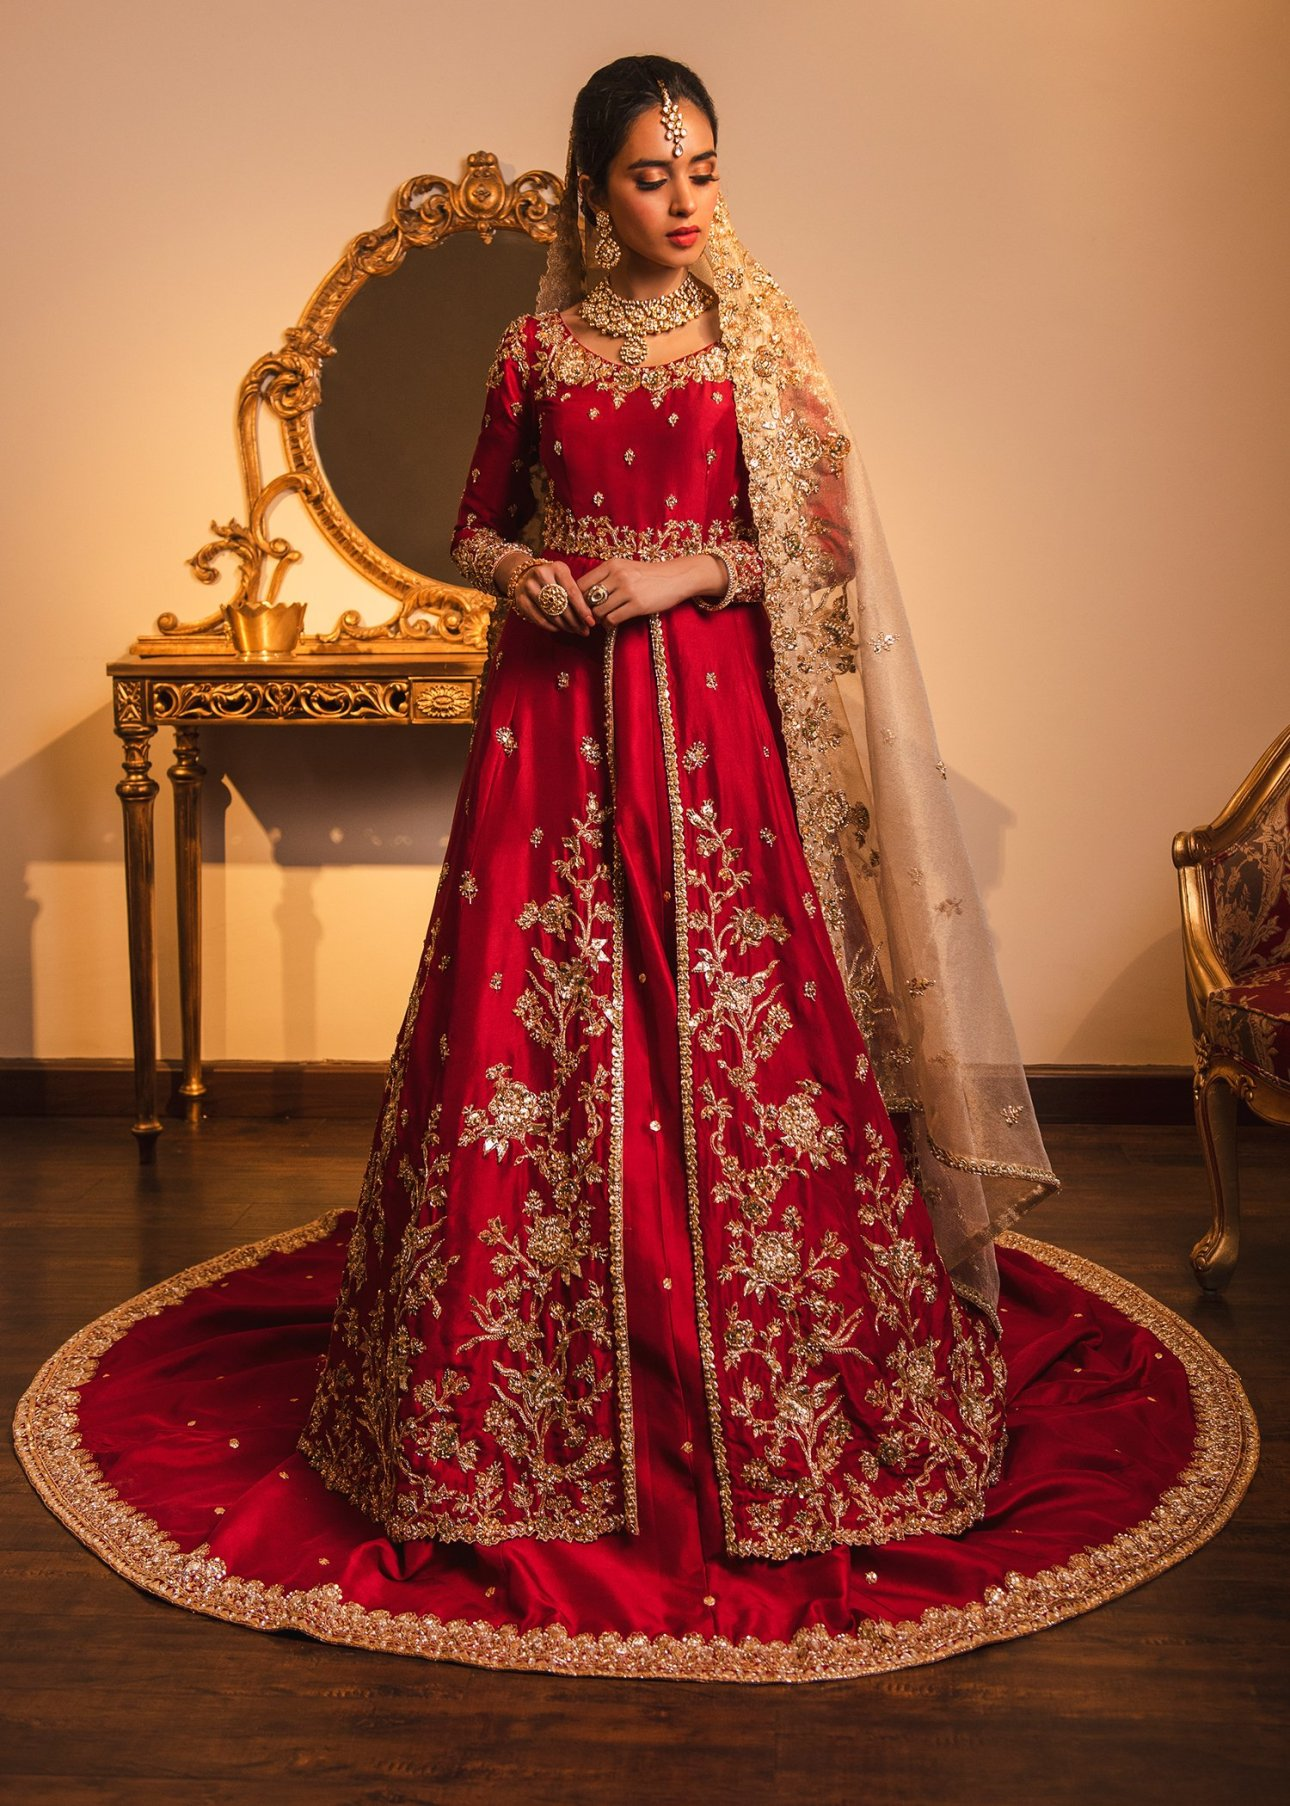 Sadaf Fawad KhanDesigner Pakistani Wedding Dress